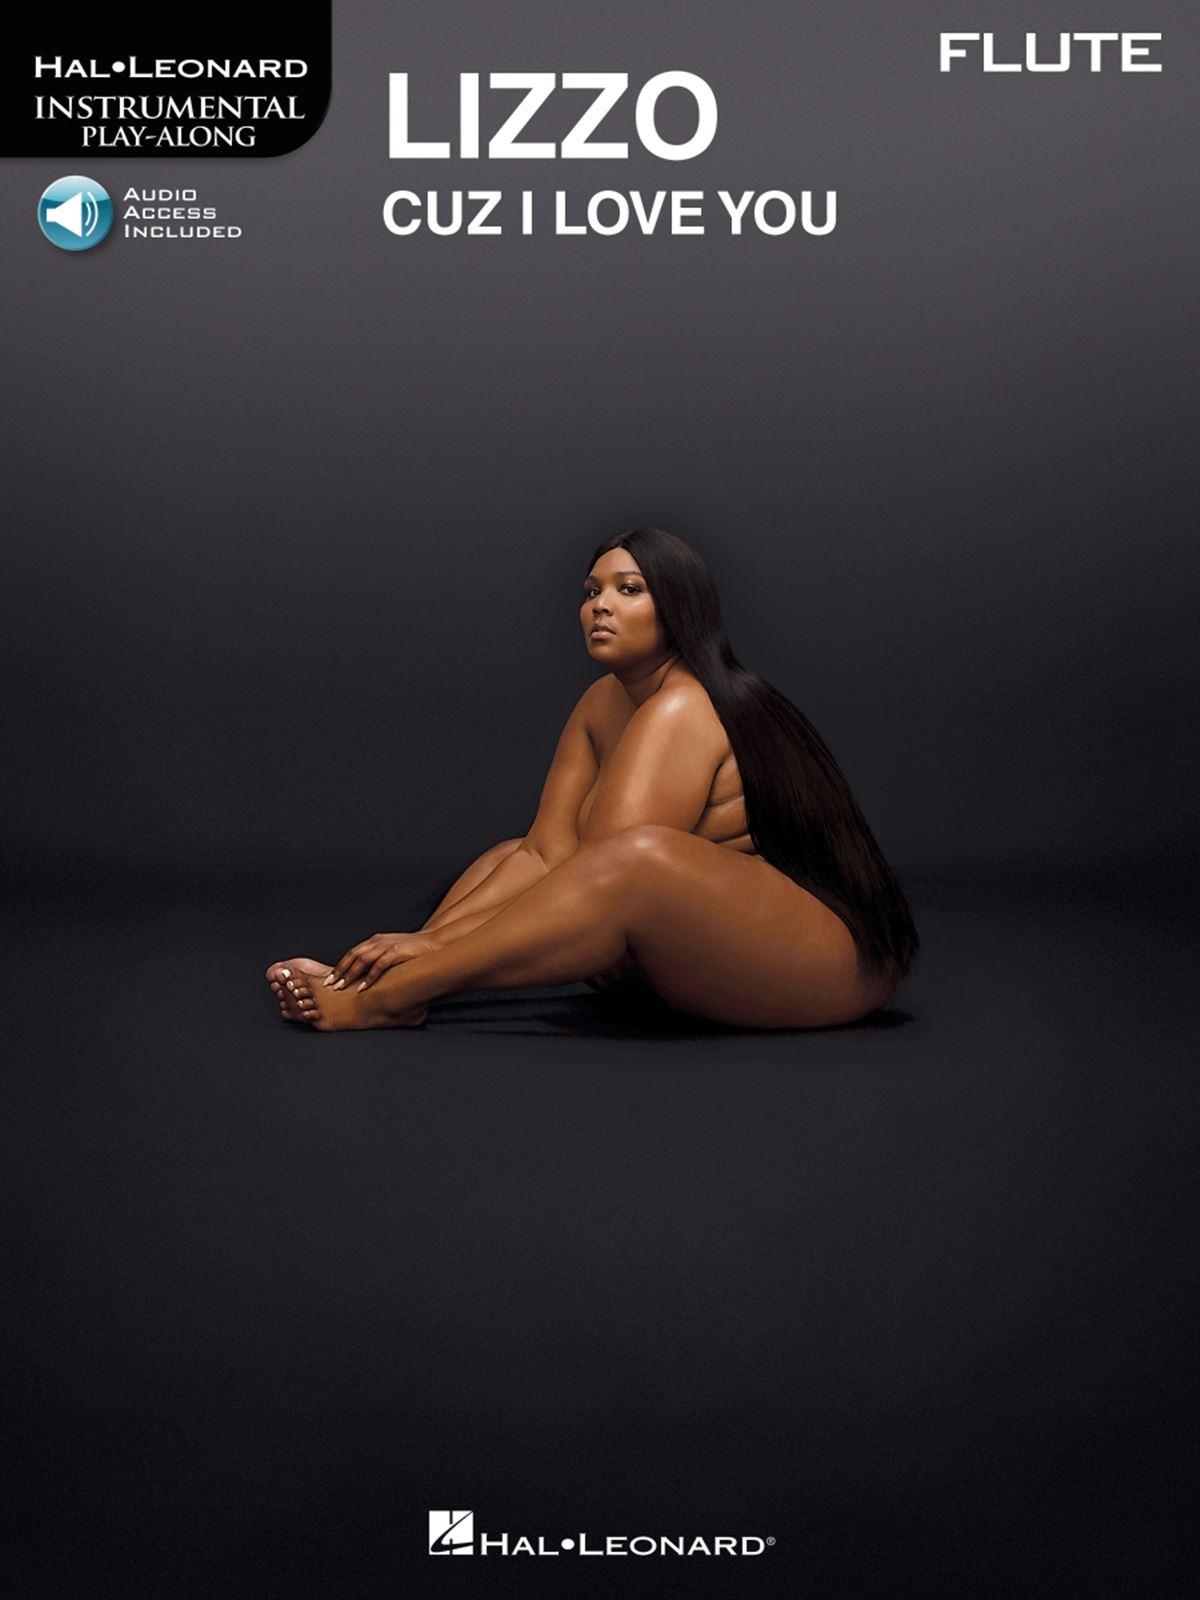 Cuz I Love You